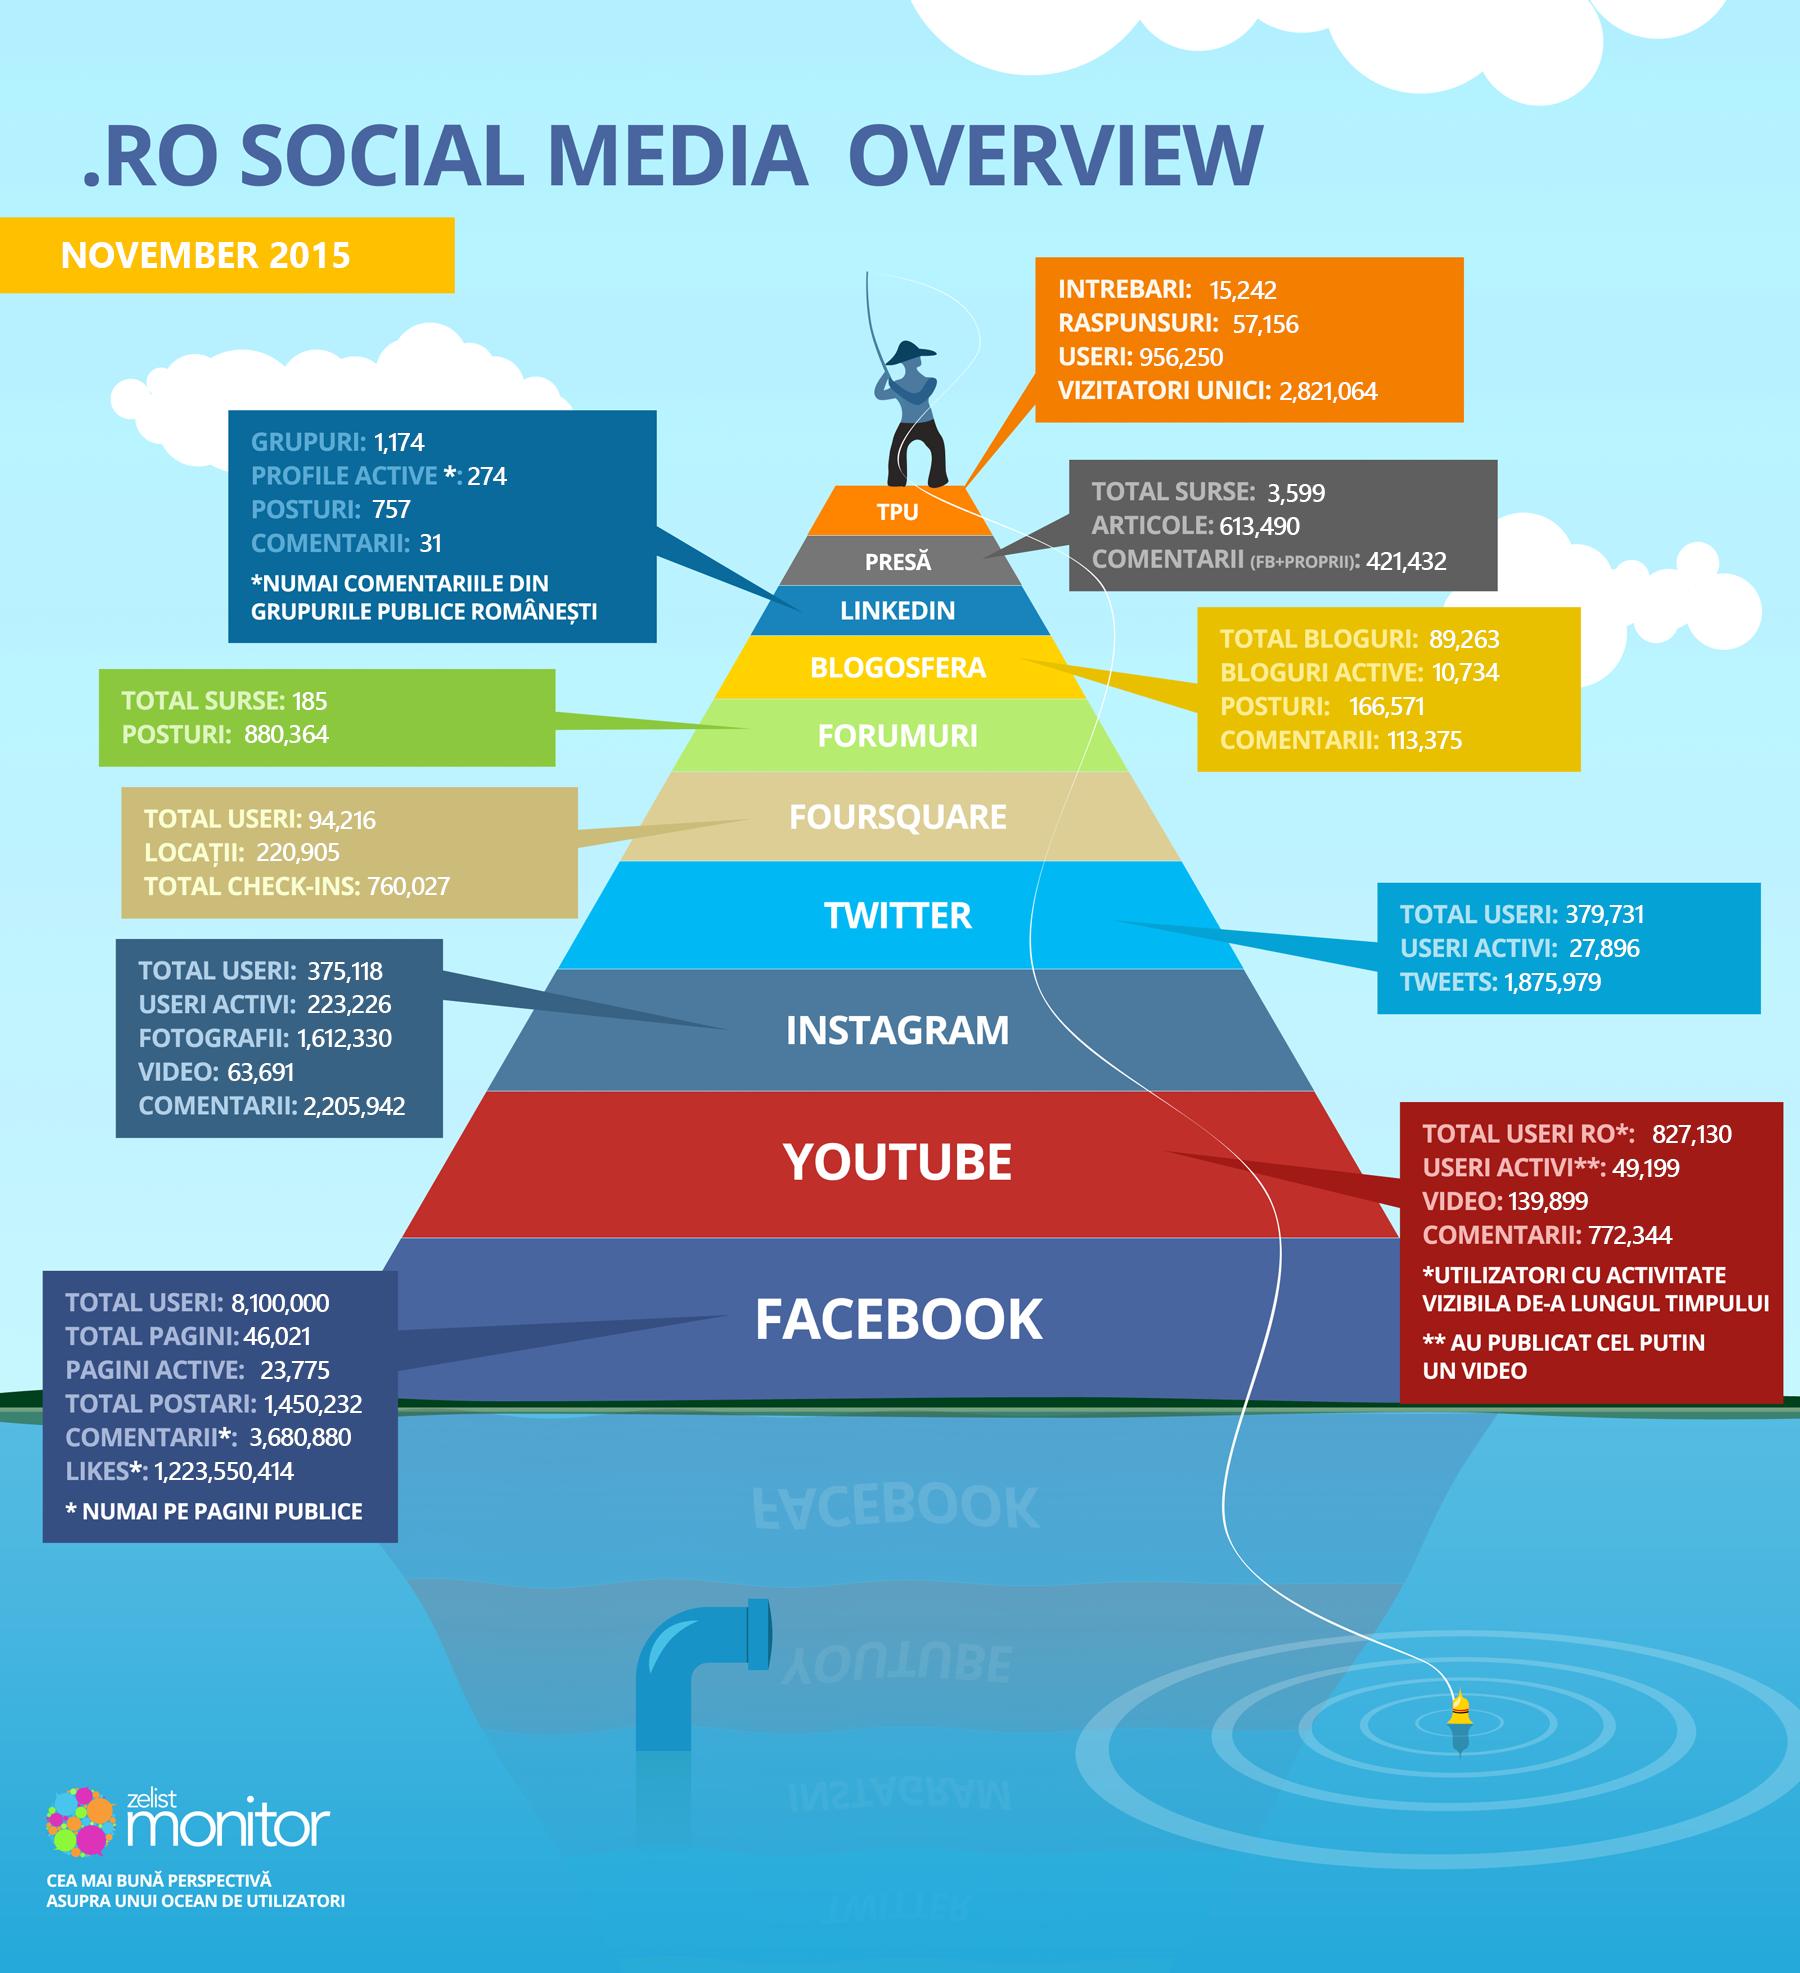 infographic_piramida_november_2015 (1)